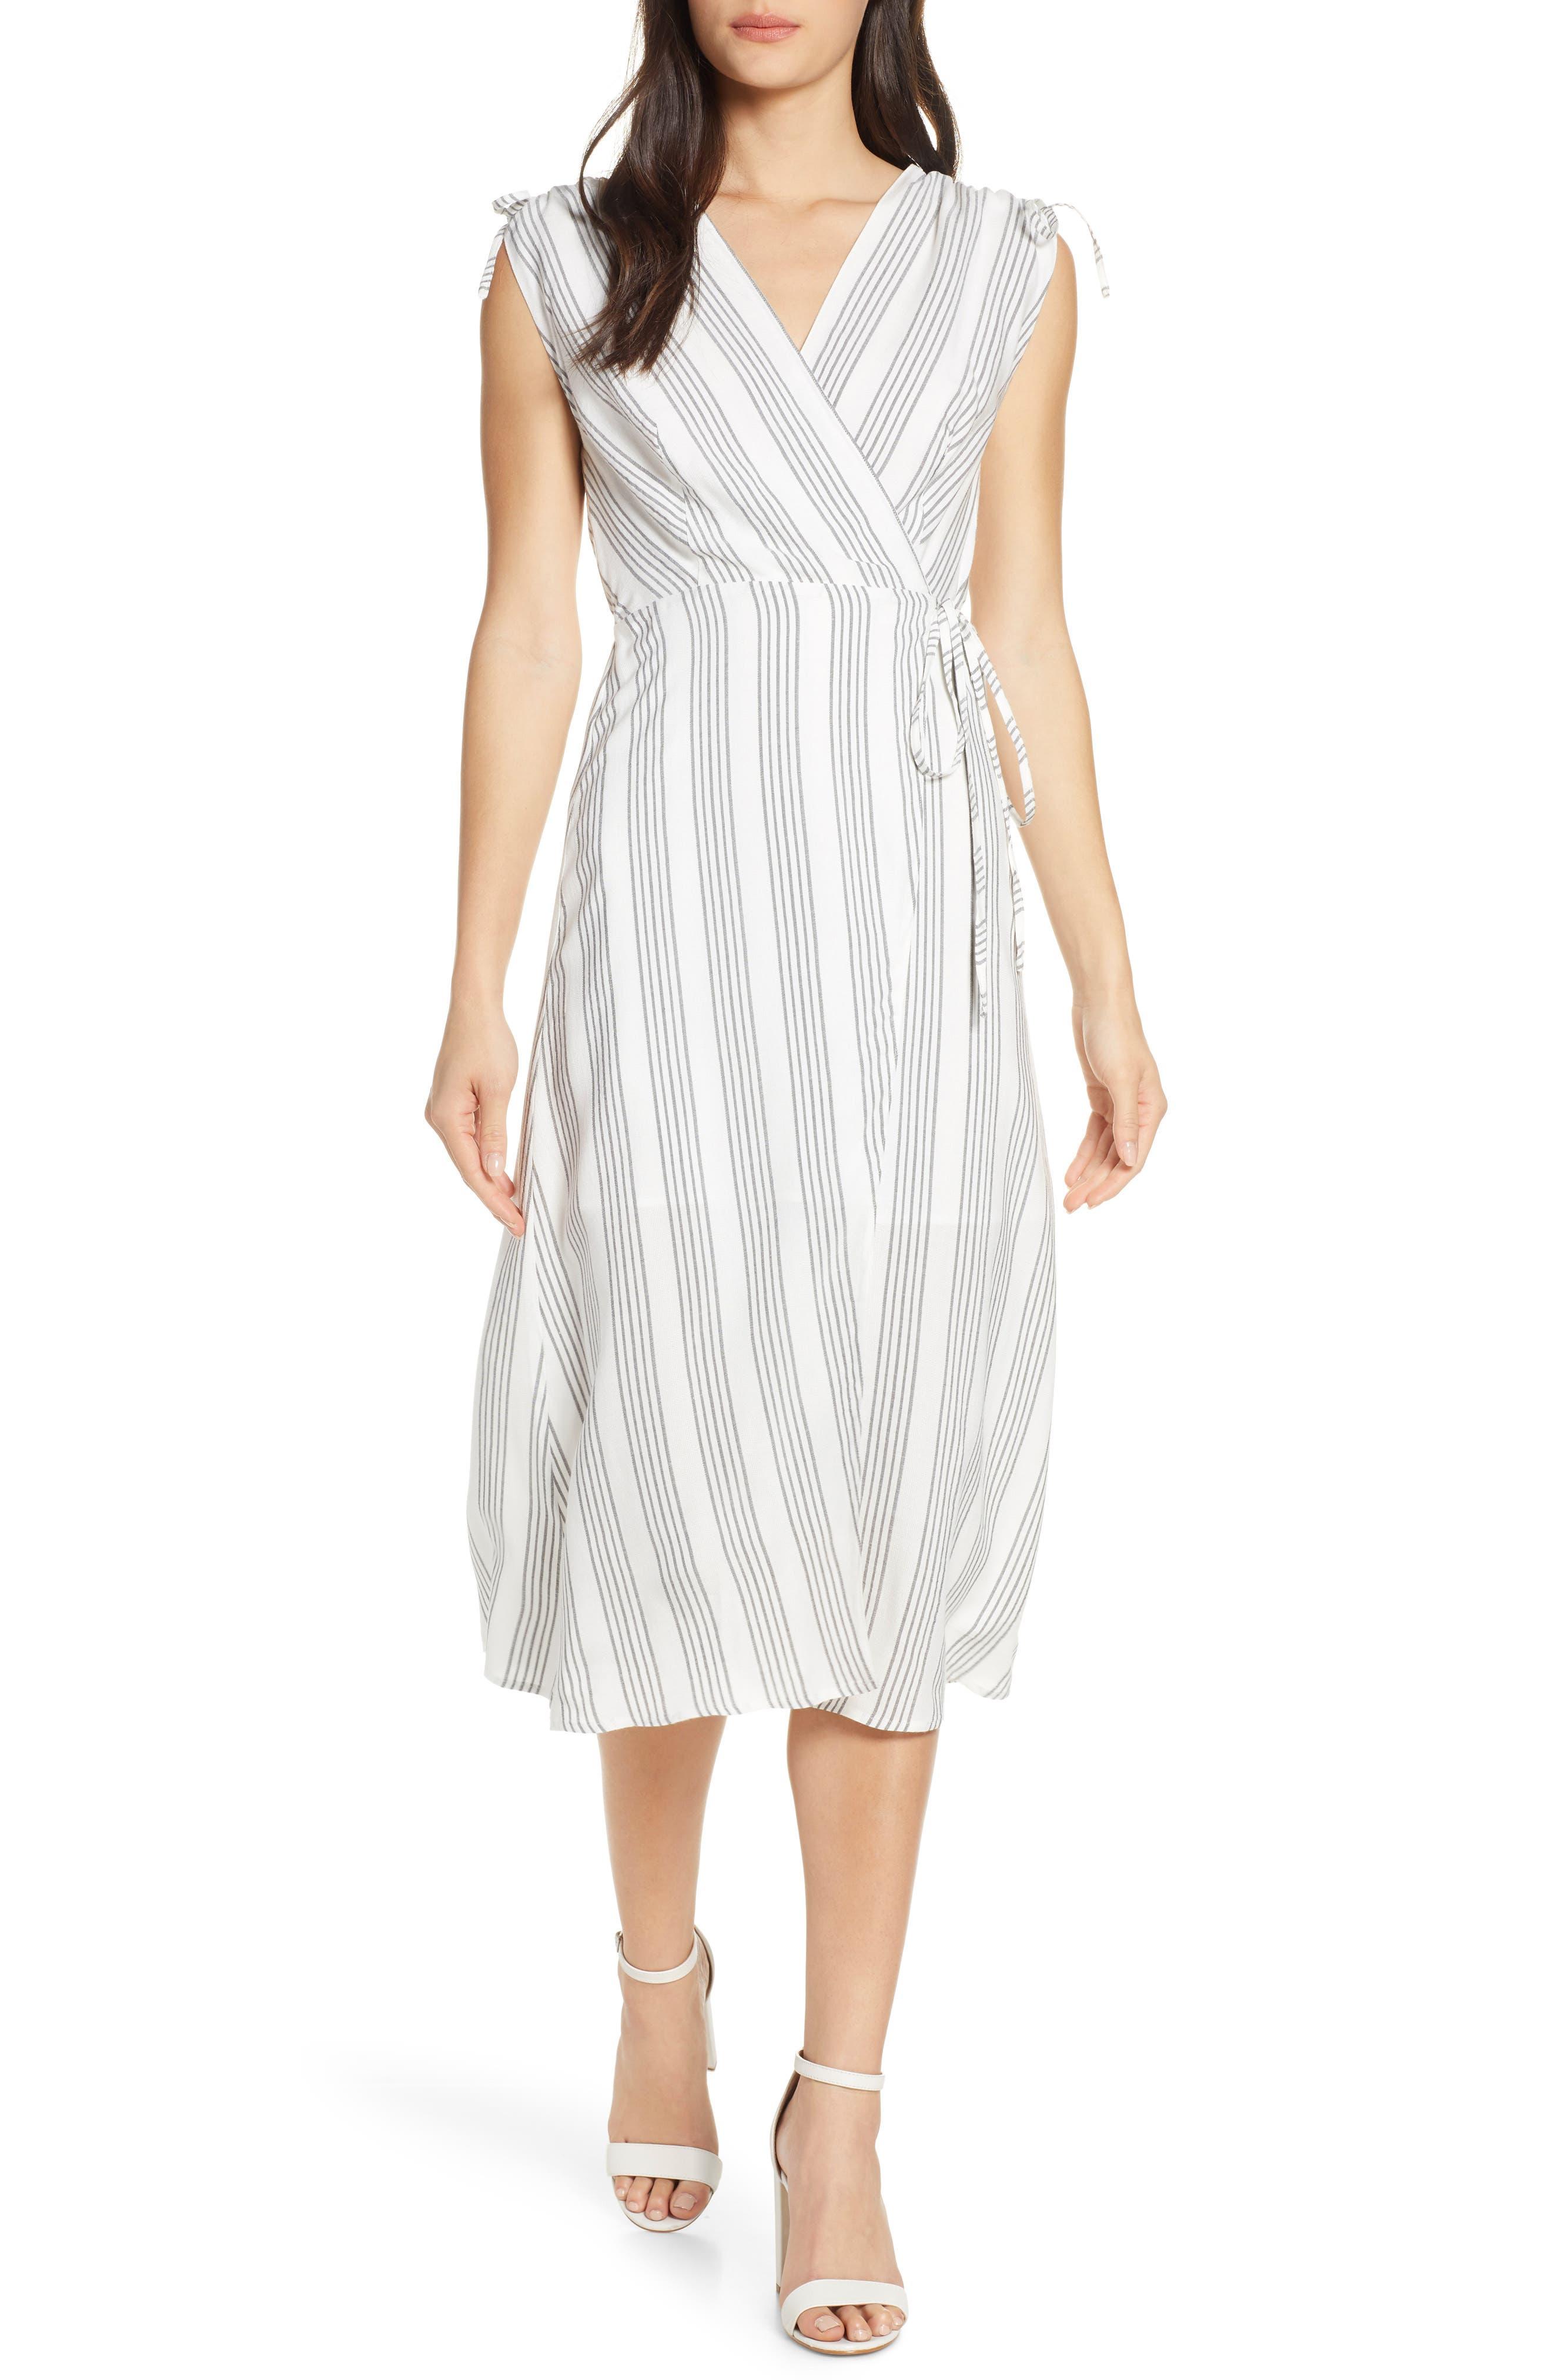 Ali & Jay Pershing Square Midi Wrap Dress, White